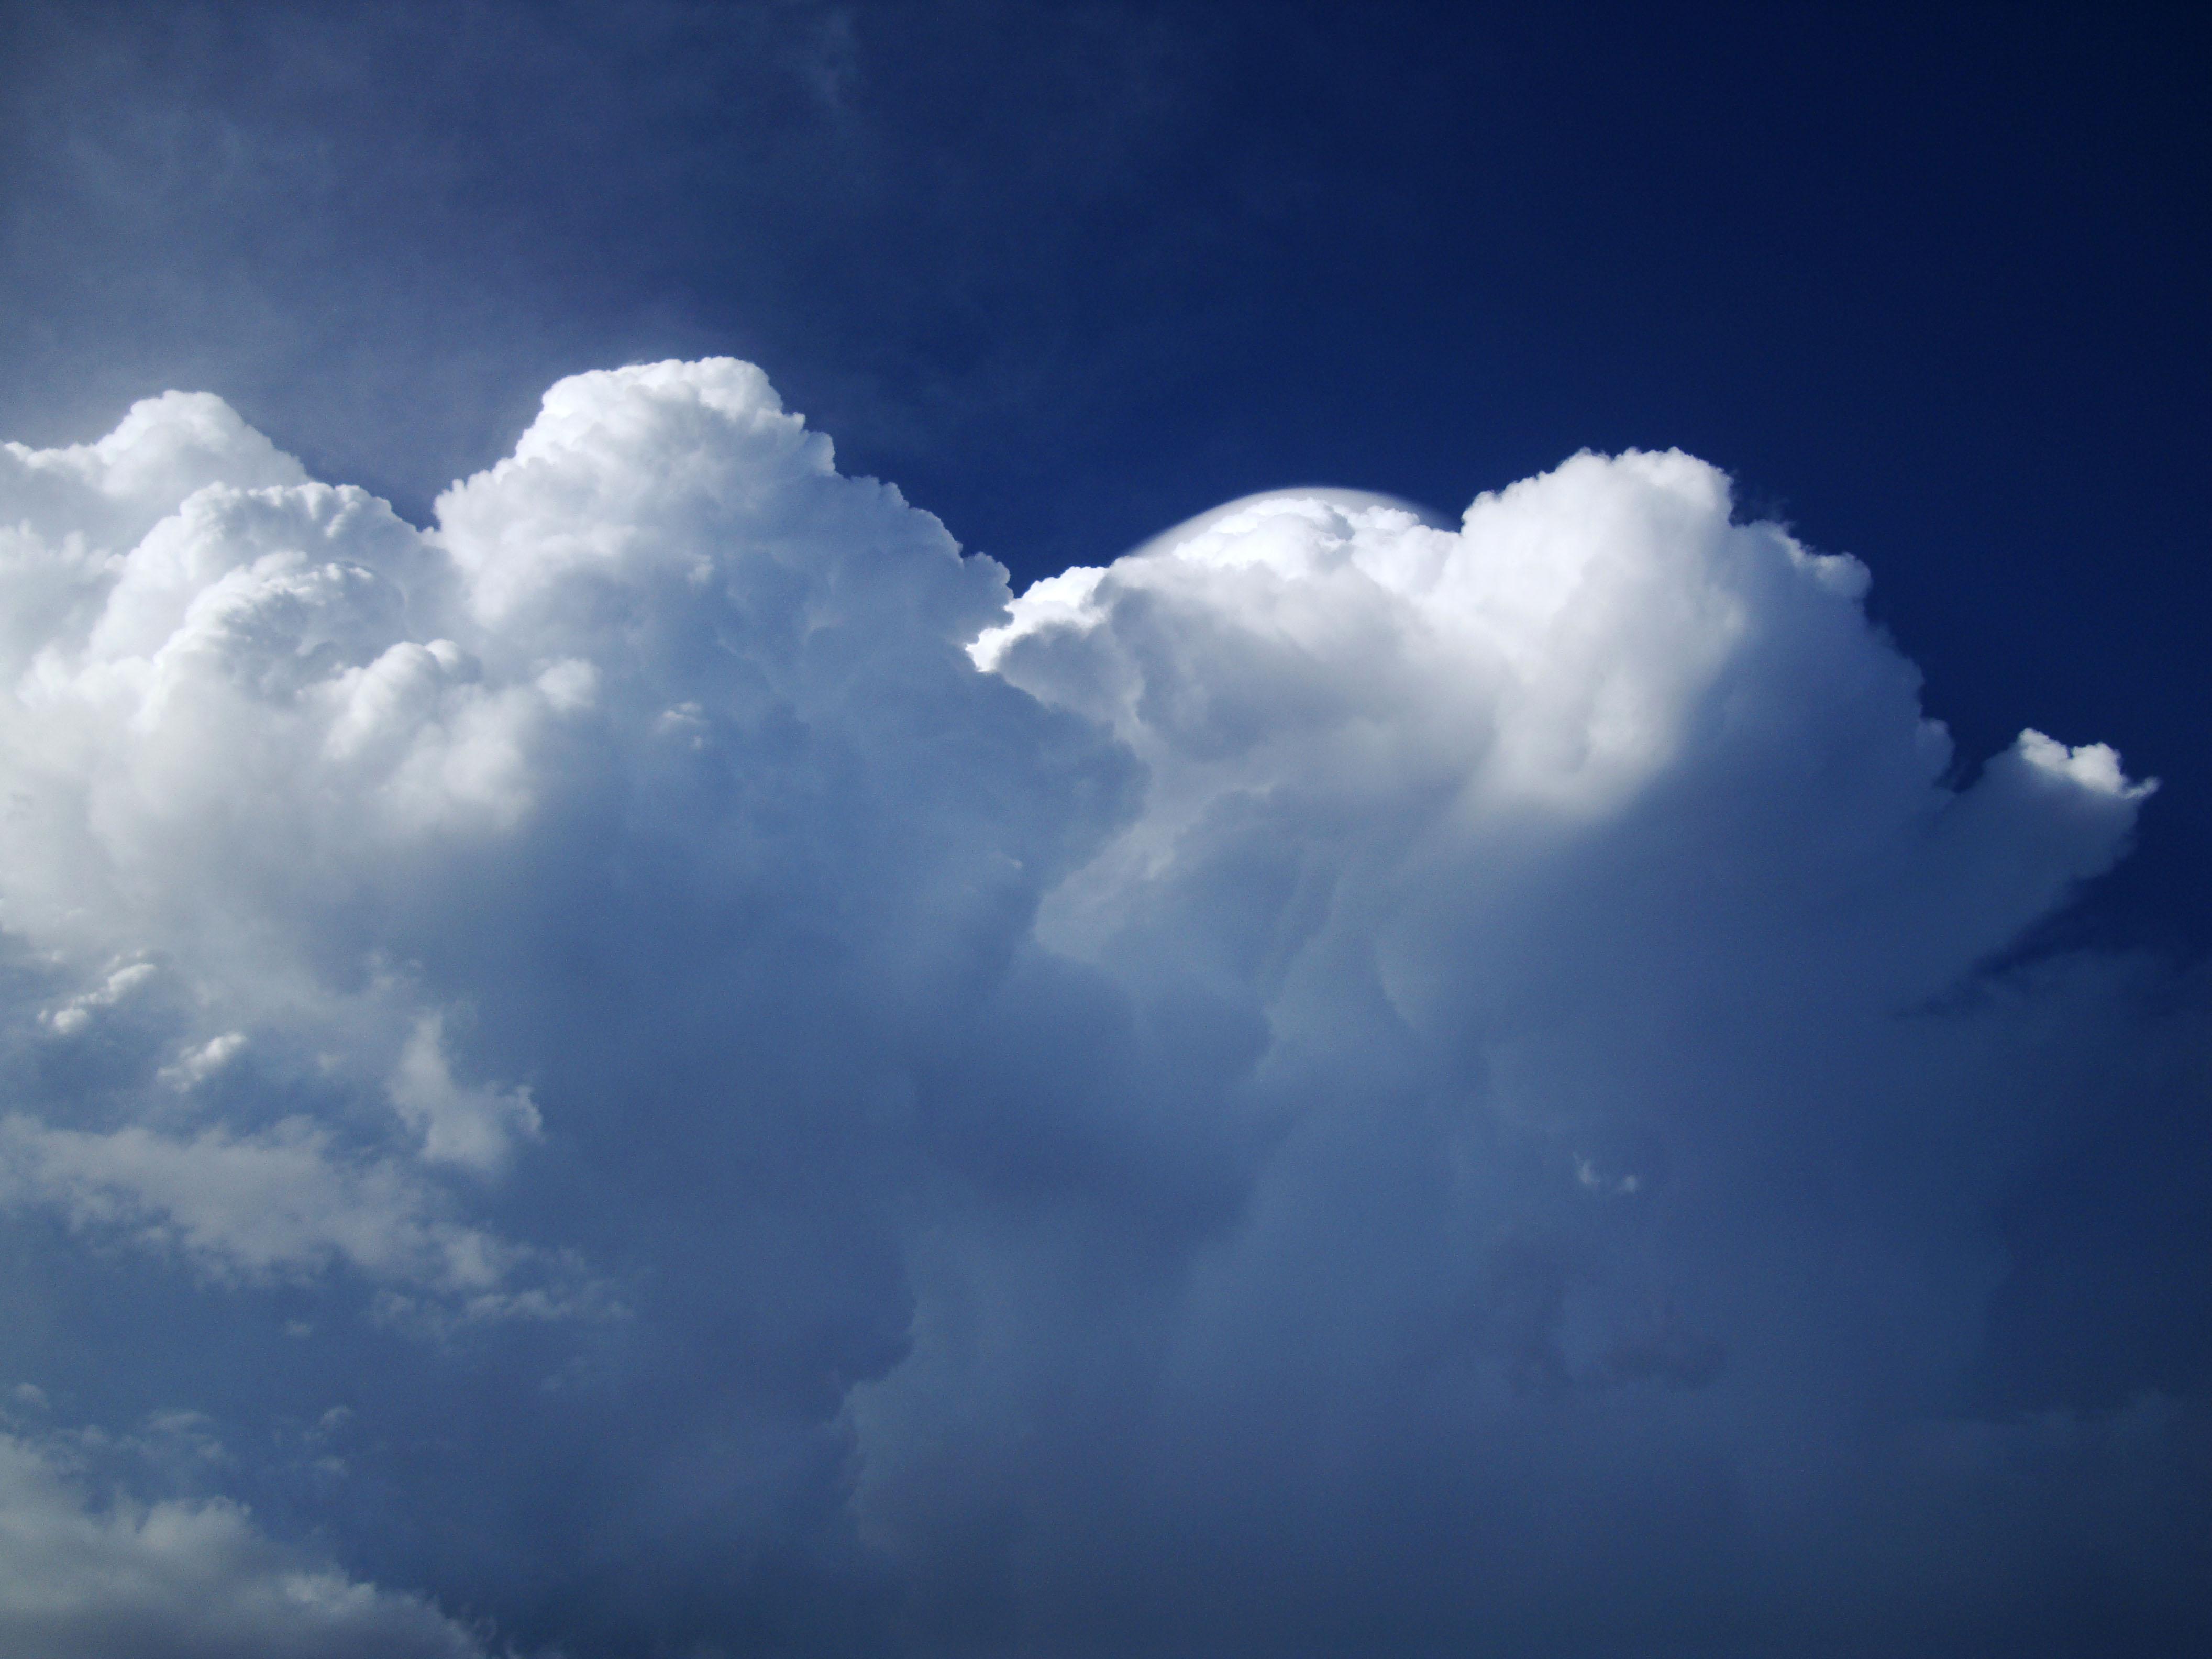 Cumulonimbus Clouds Formations Sky Storms Weather Phenomena 04